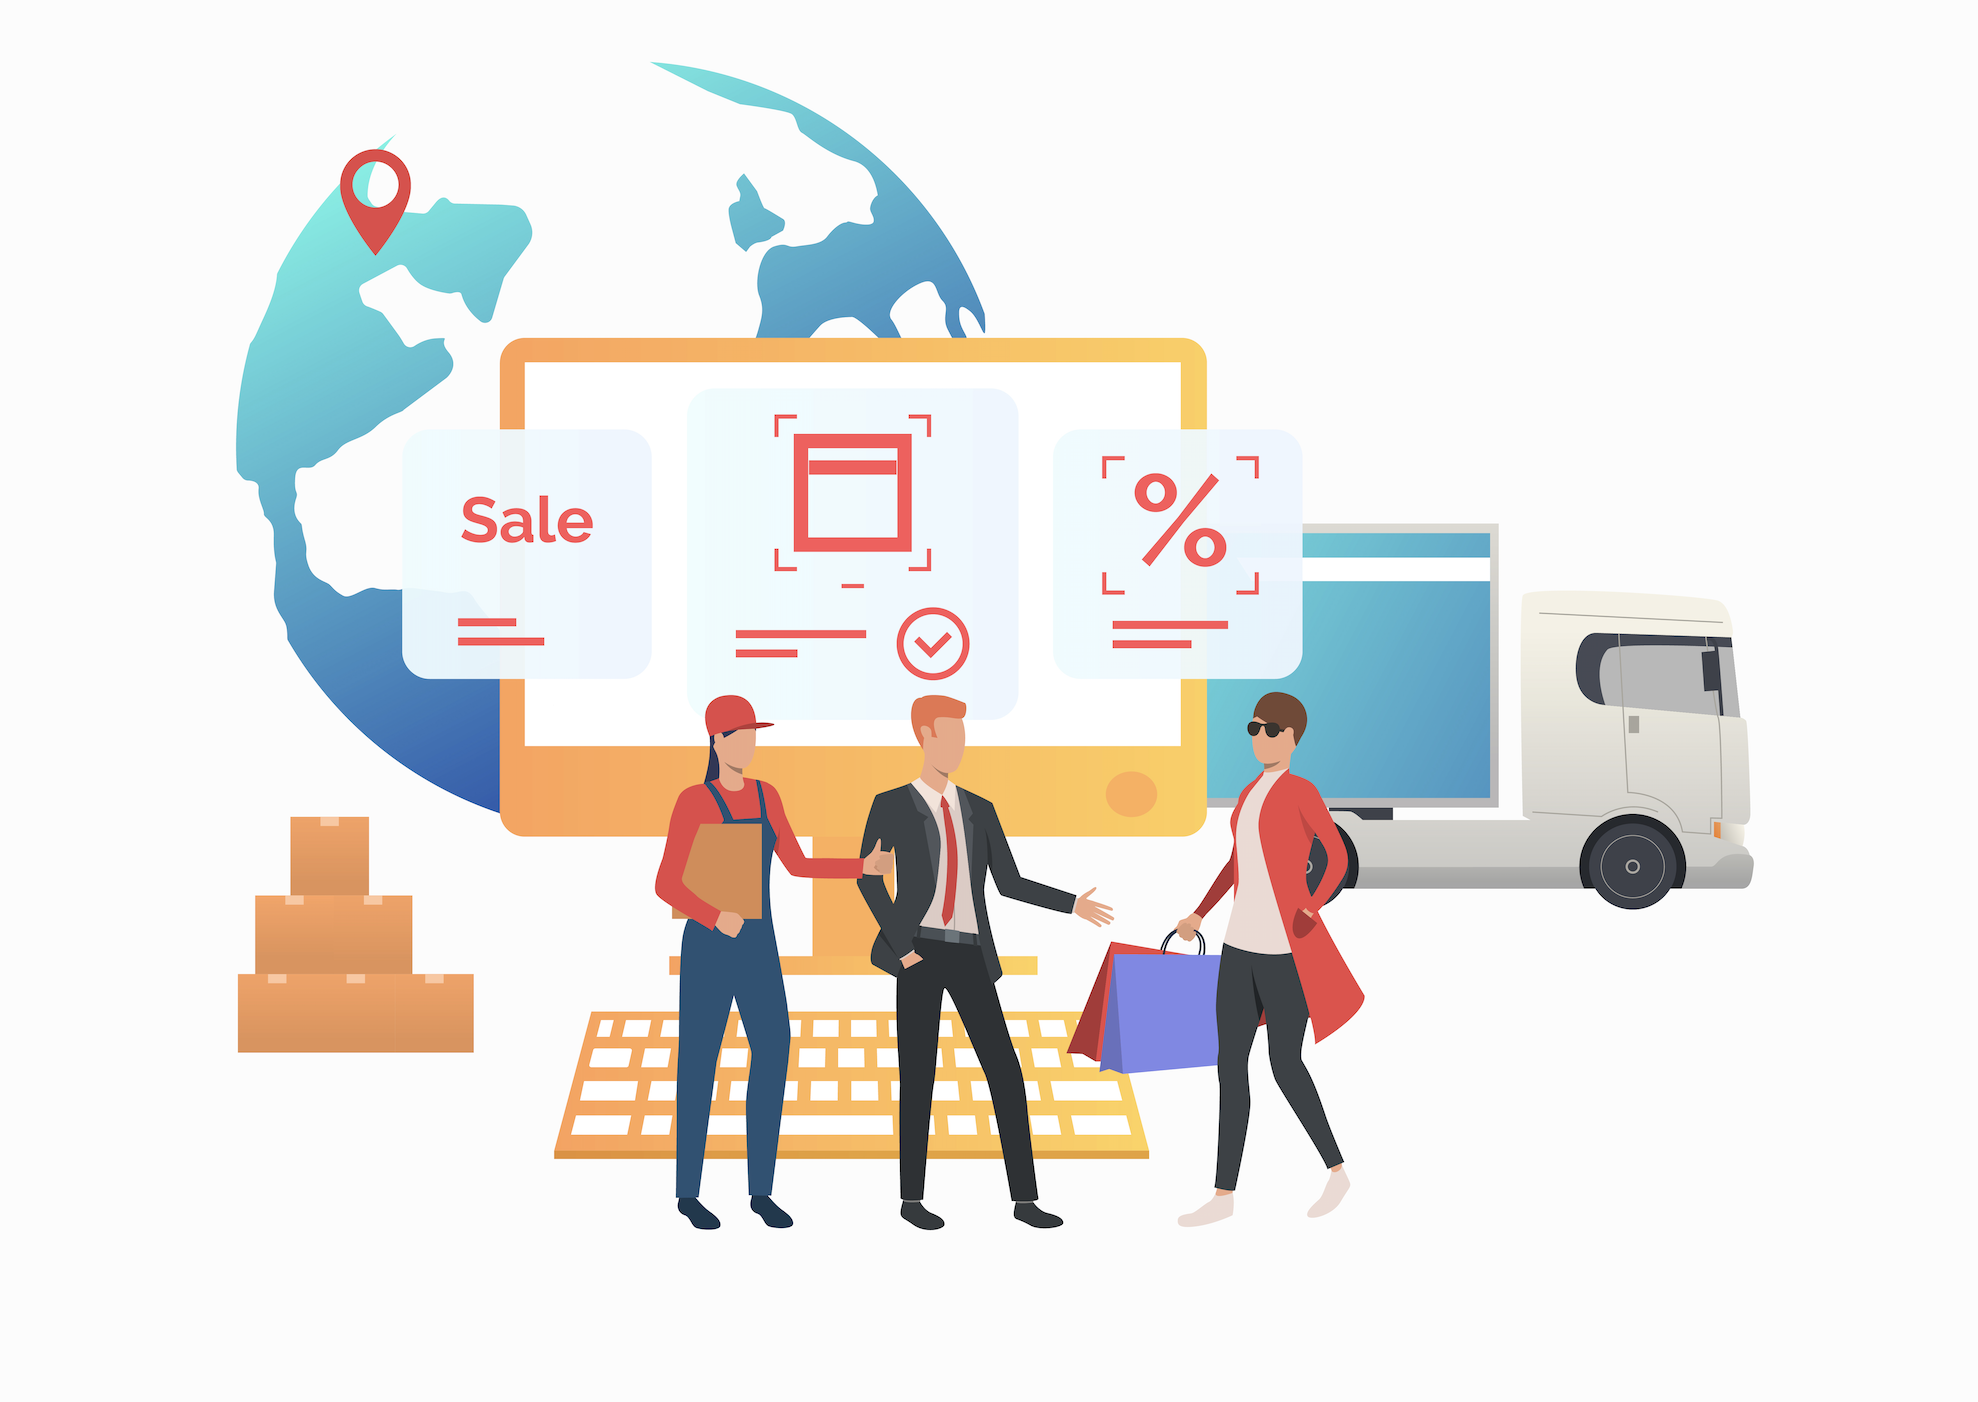 order types - sales order